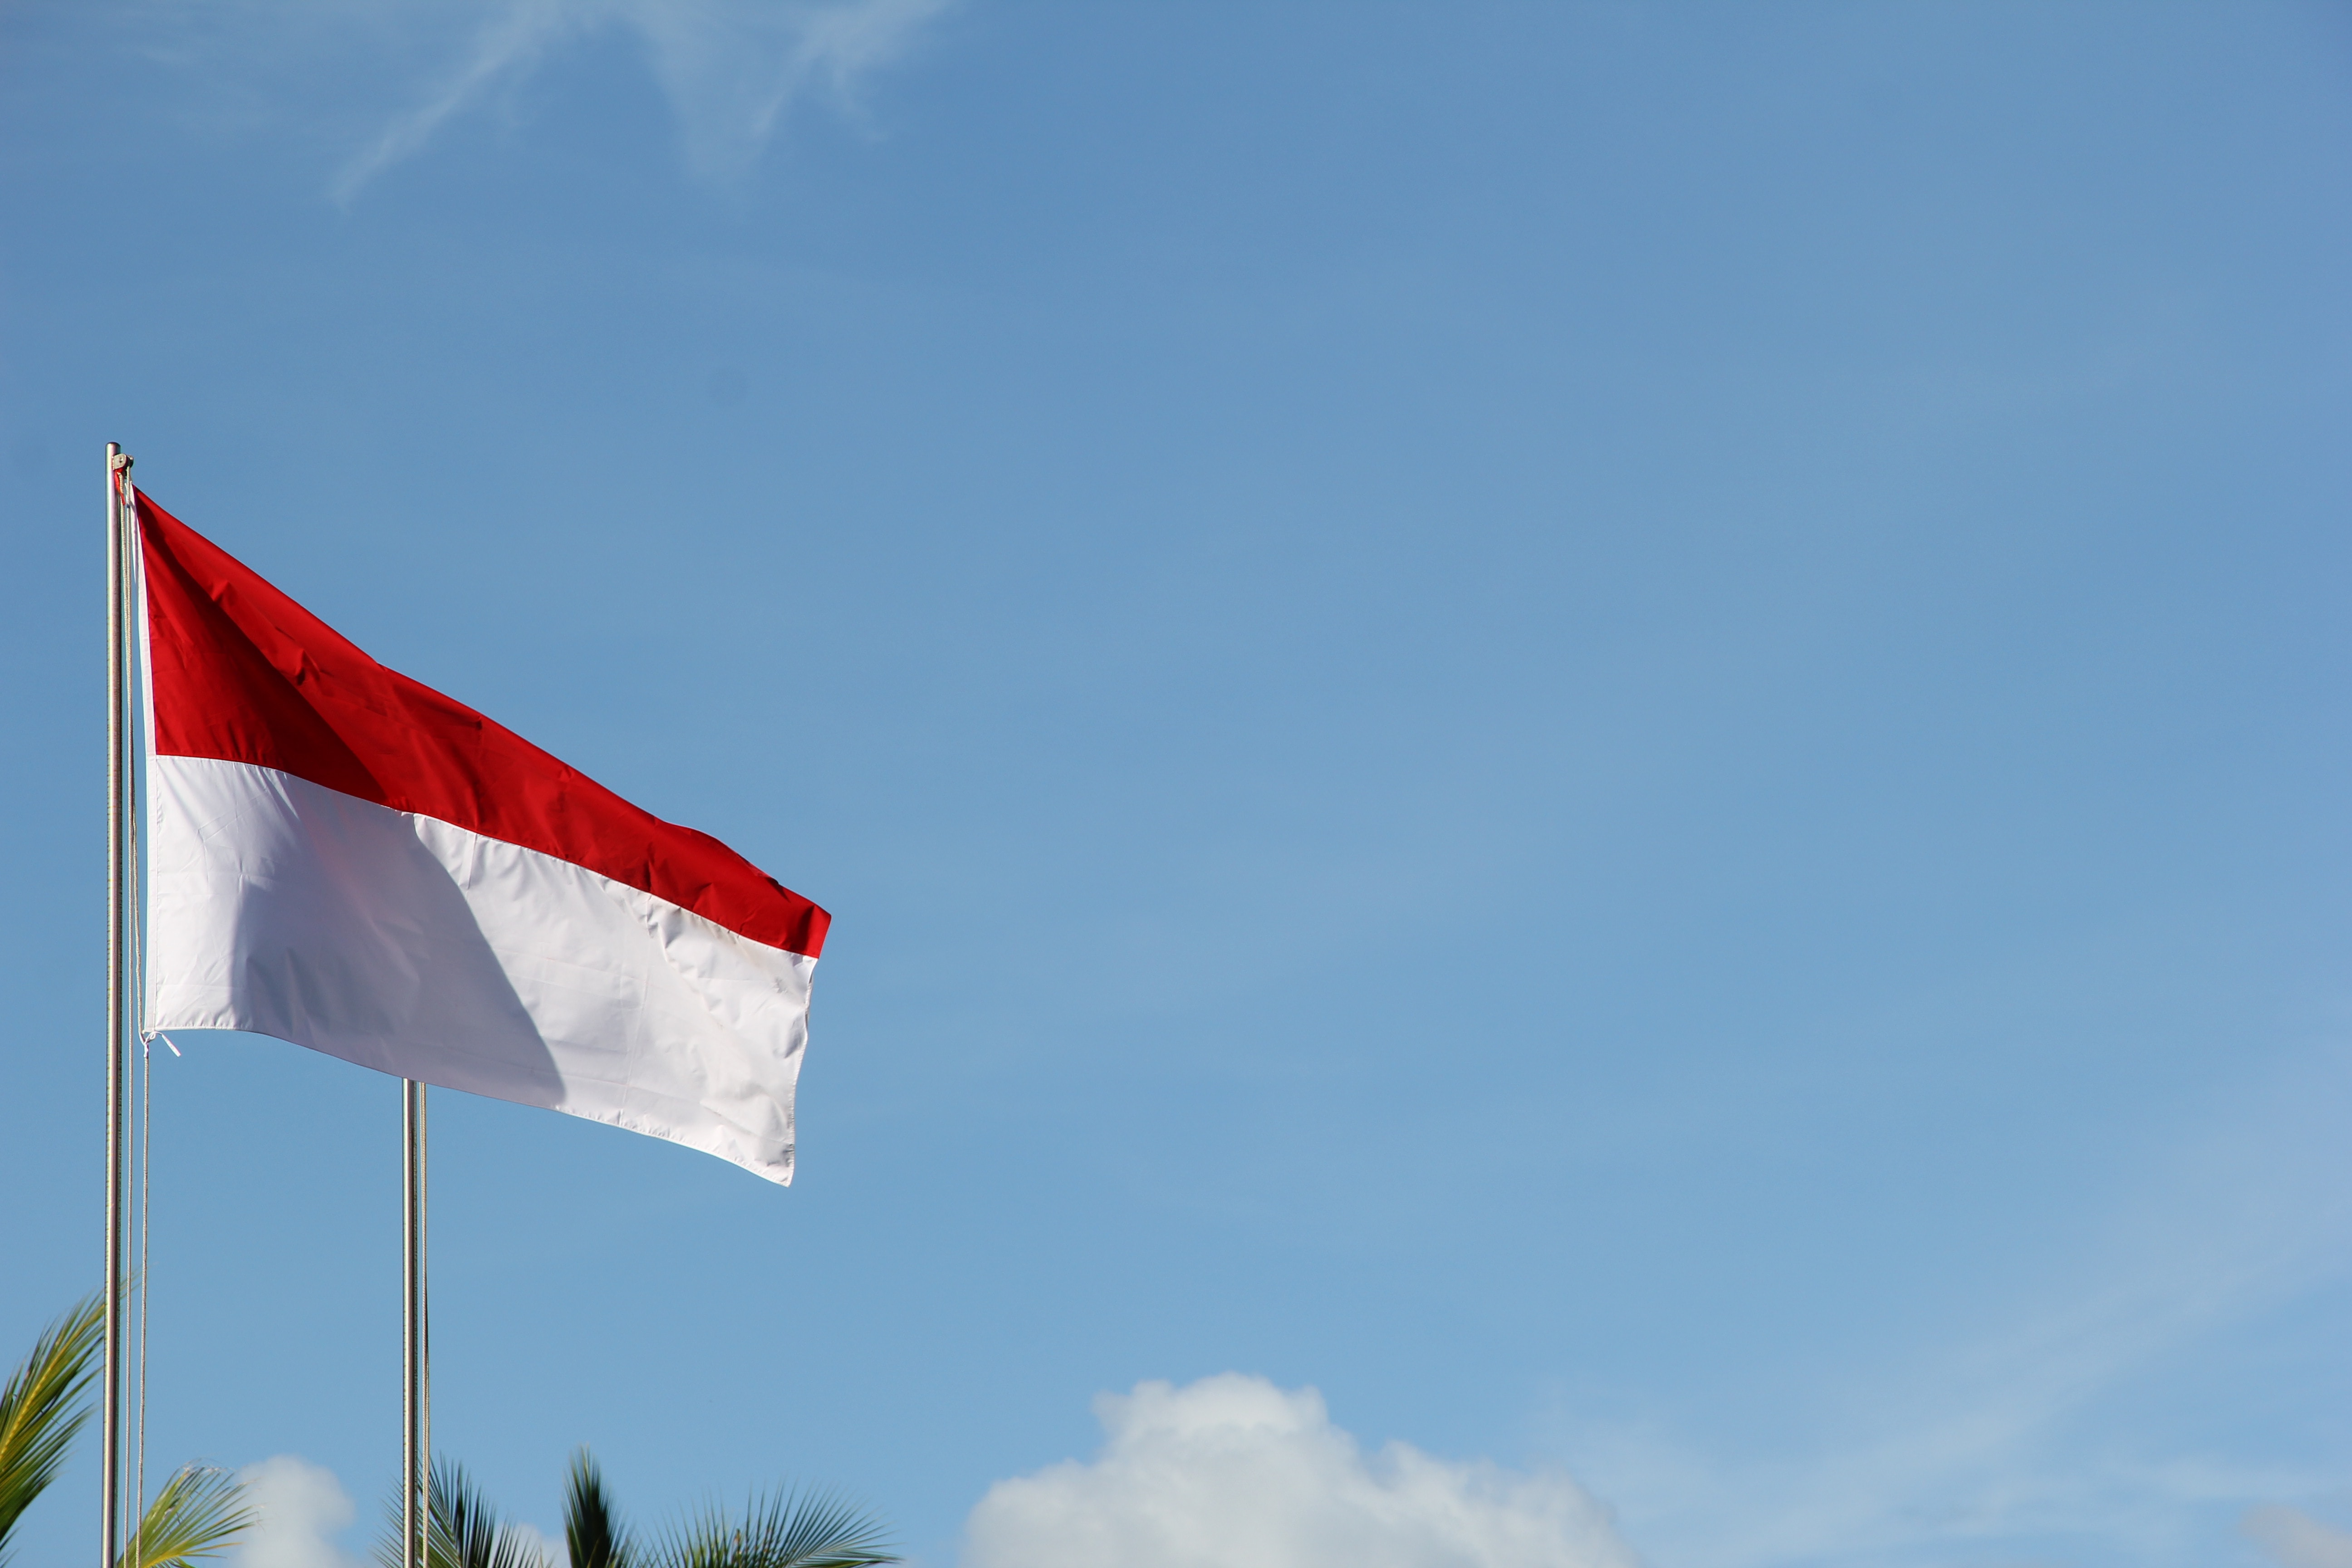 Bendera Indonesia | Foto: Nick Agus Arya/Unsplash